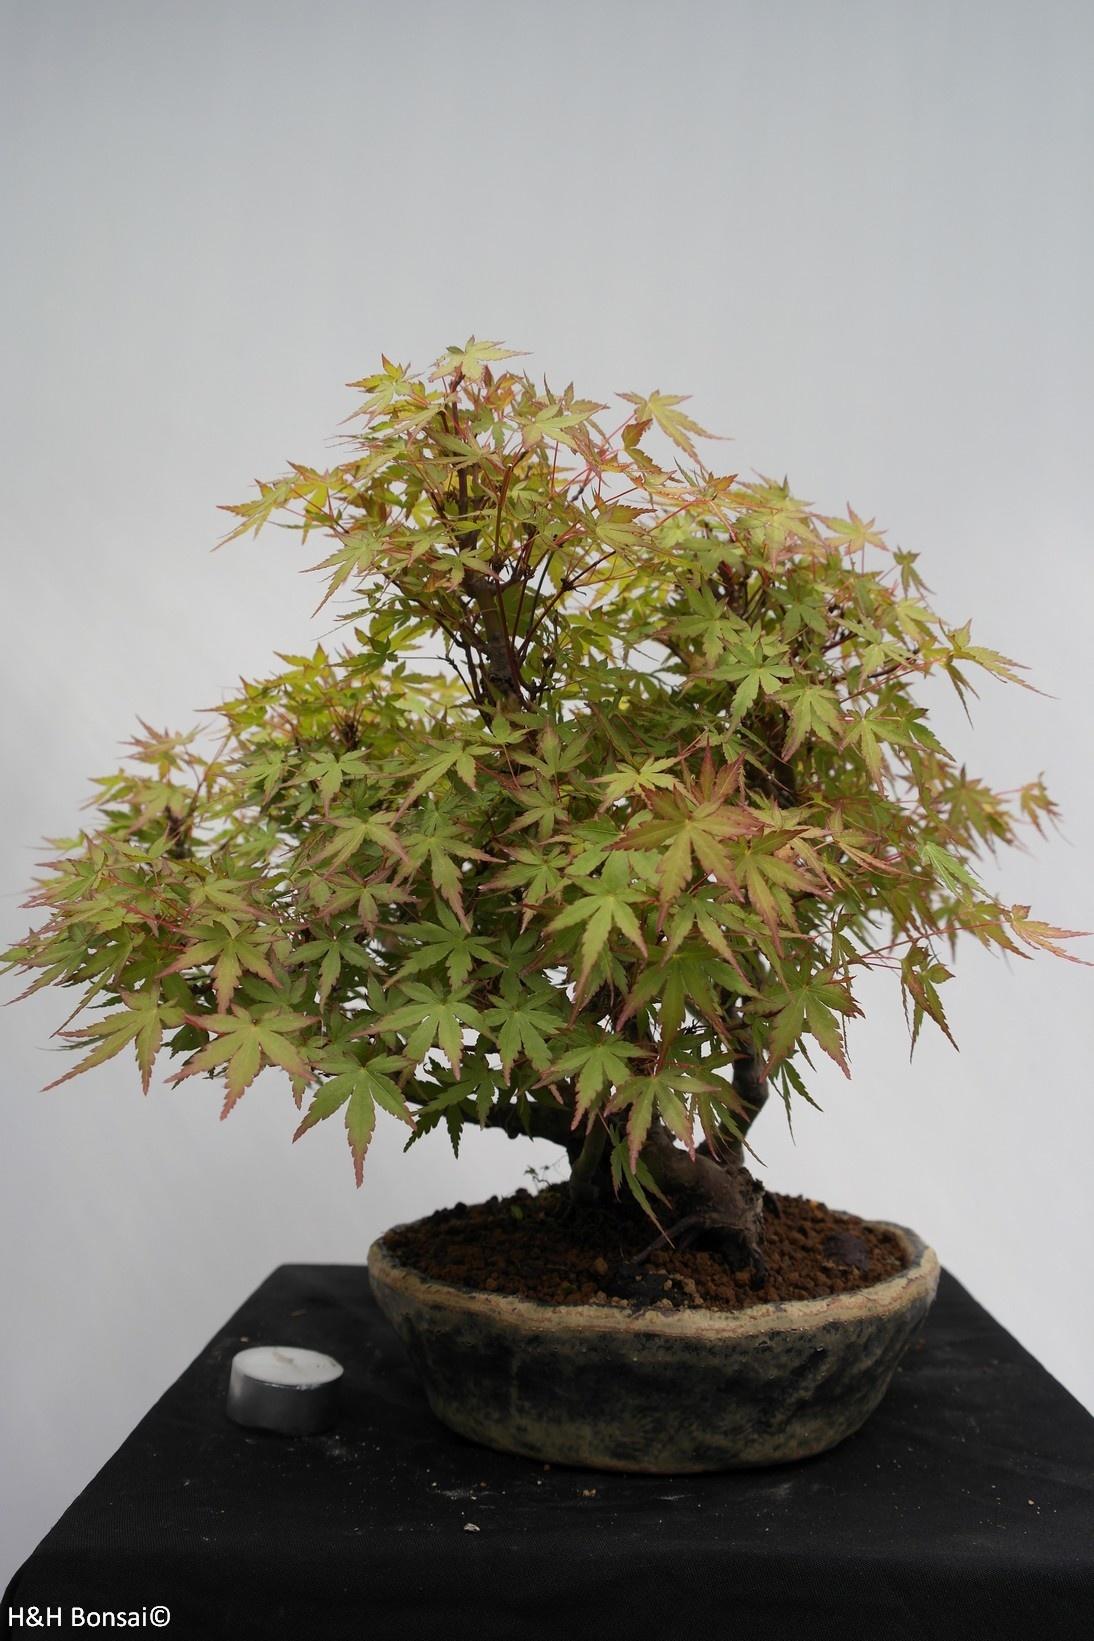 Bonsai Japanese maple, Acer palmatum, no. 7447